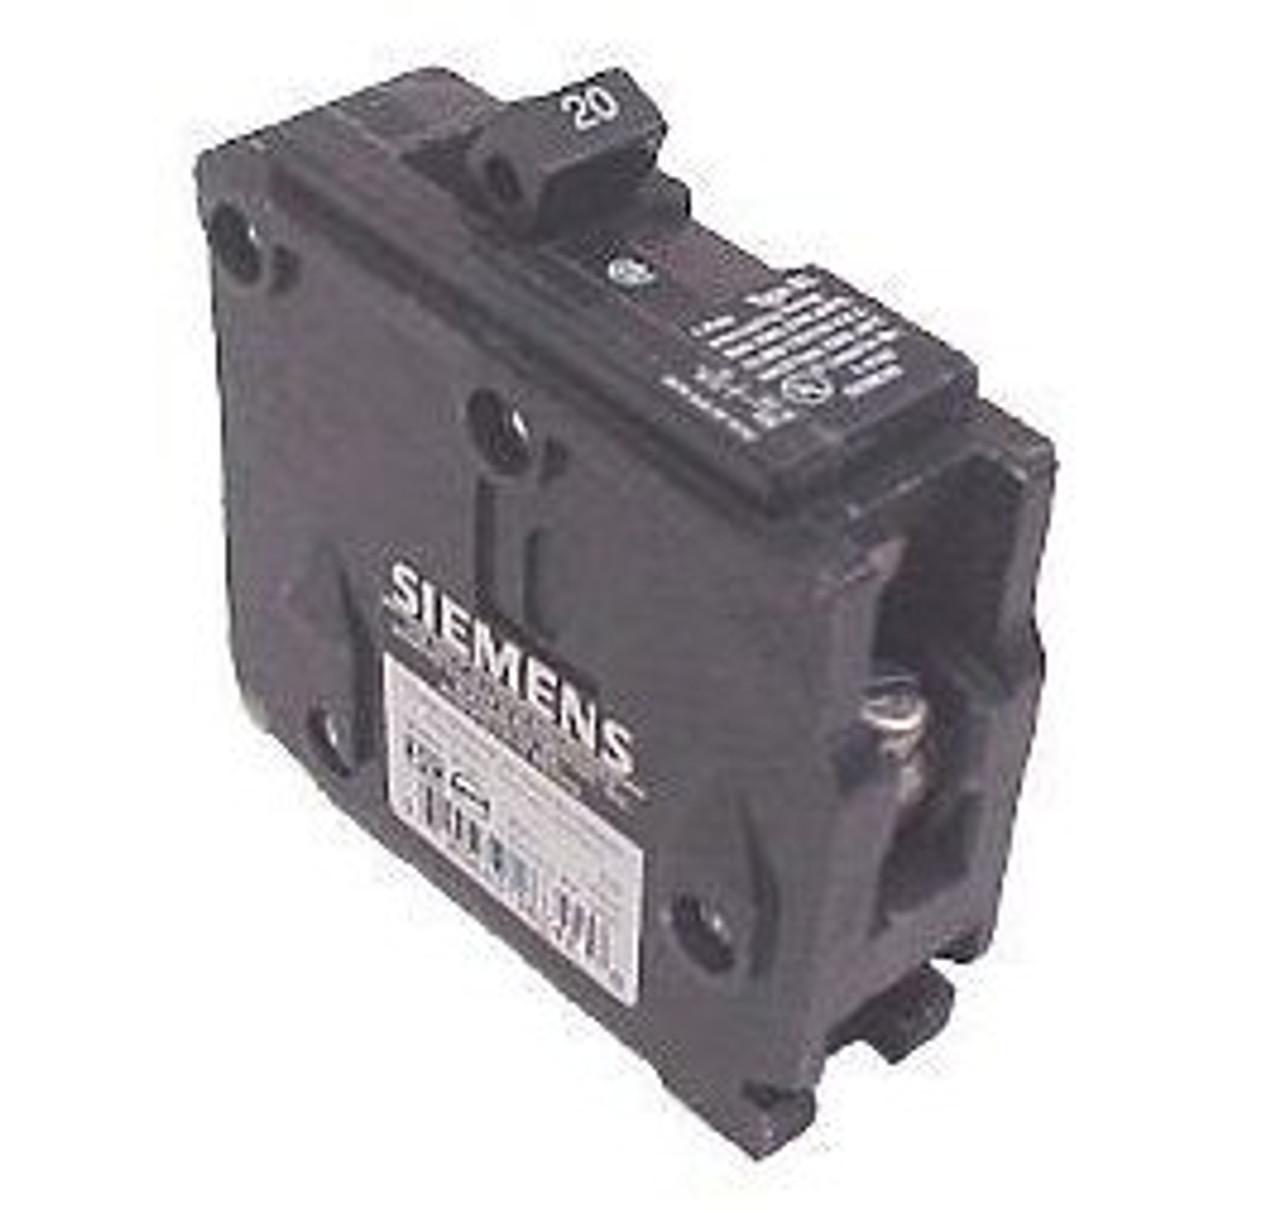 Siemens B130 1 Pole 30 Amp 120VAC Type BL Circuit Breaker - Used